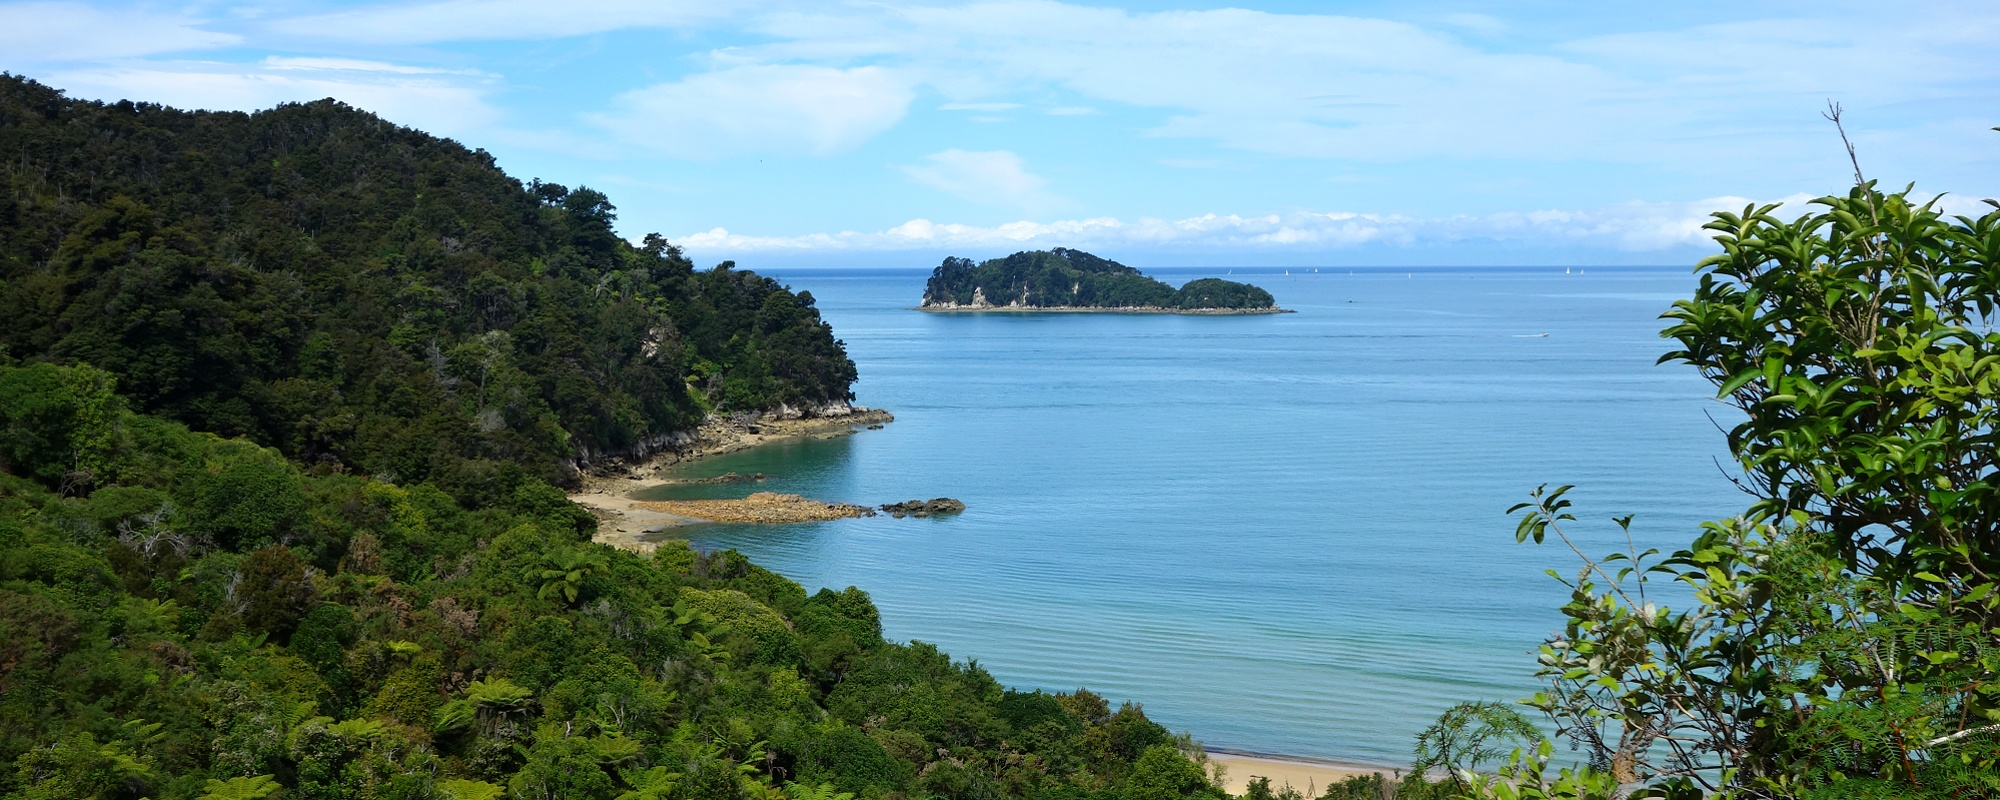 Abel Tasman, South Island, New Zealand